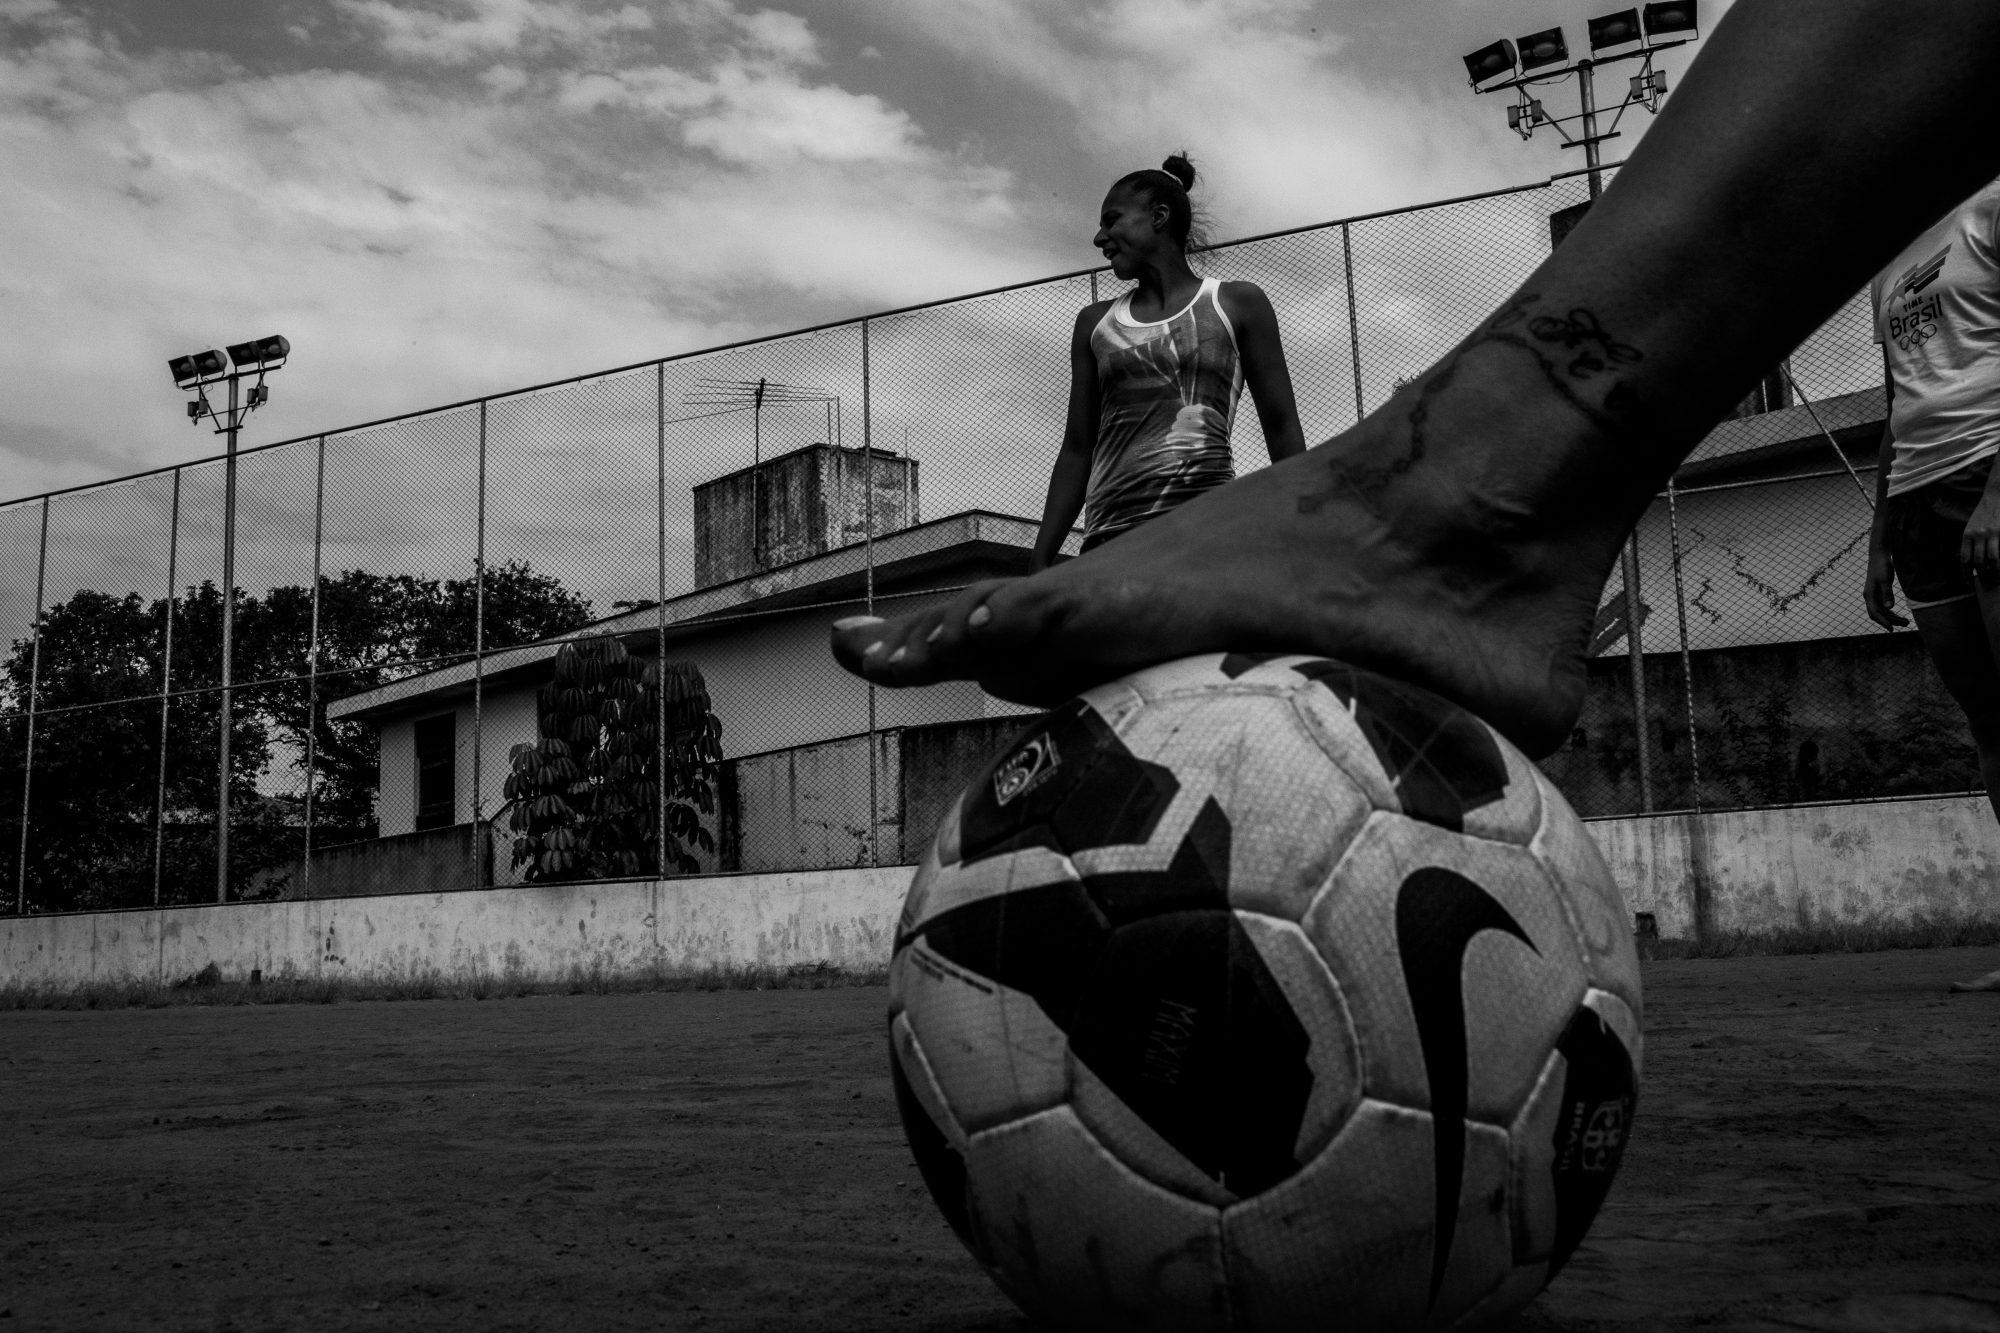 Projeto Guerreiras, 2014. Photo: Daniel Kfouri